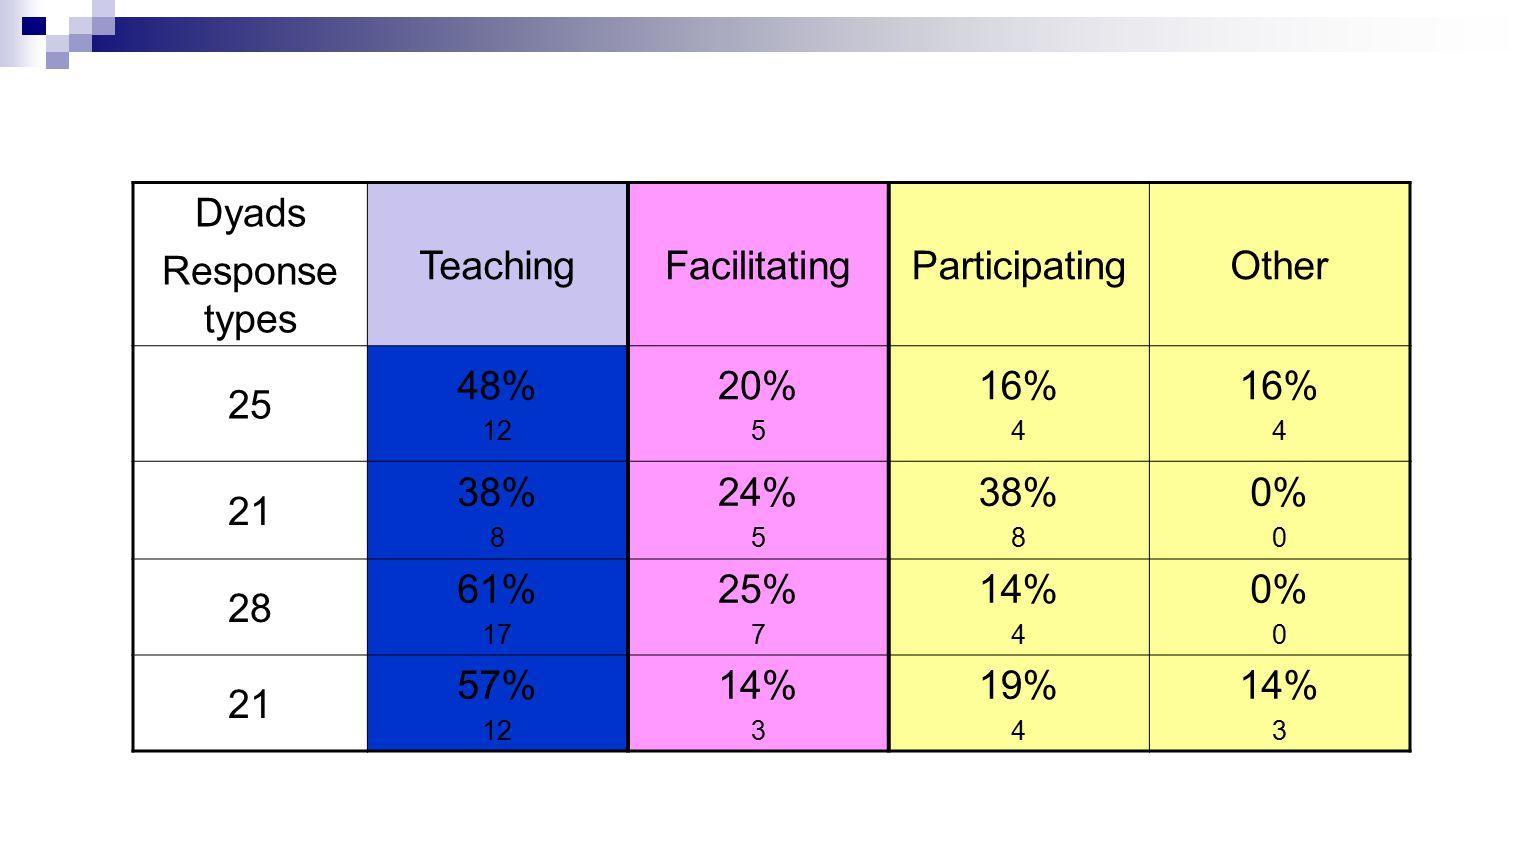 Dyads Response types TeachingFacilitatingParticipatingOther 25 48% 12 20% 5 16% 4 16% 4 21 38% 8 24% 5 38% 8 0% 0 28 61% 17 25% 7 14% 4 0% 0 21 57% 12 14% 3 19% 4 14% 3